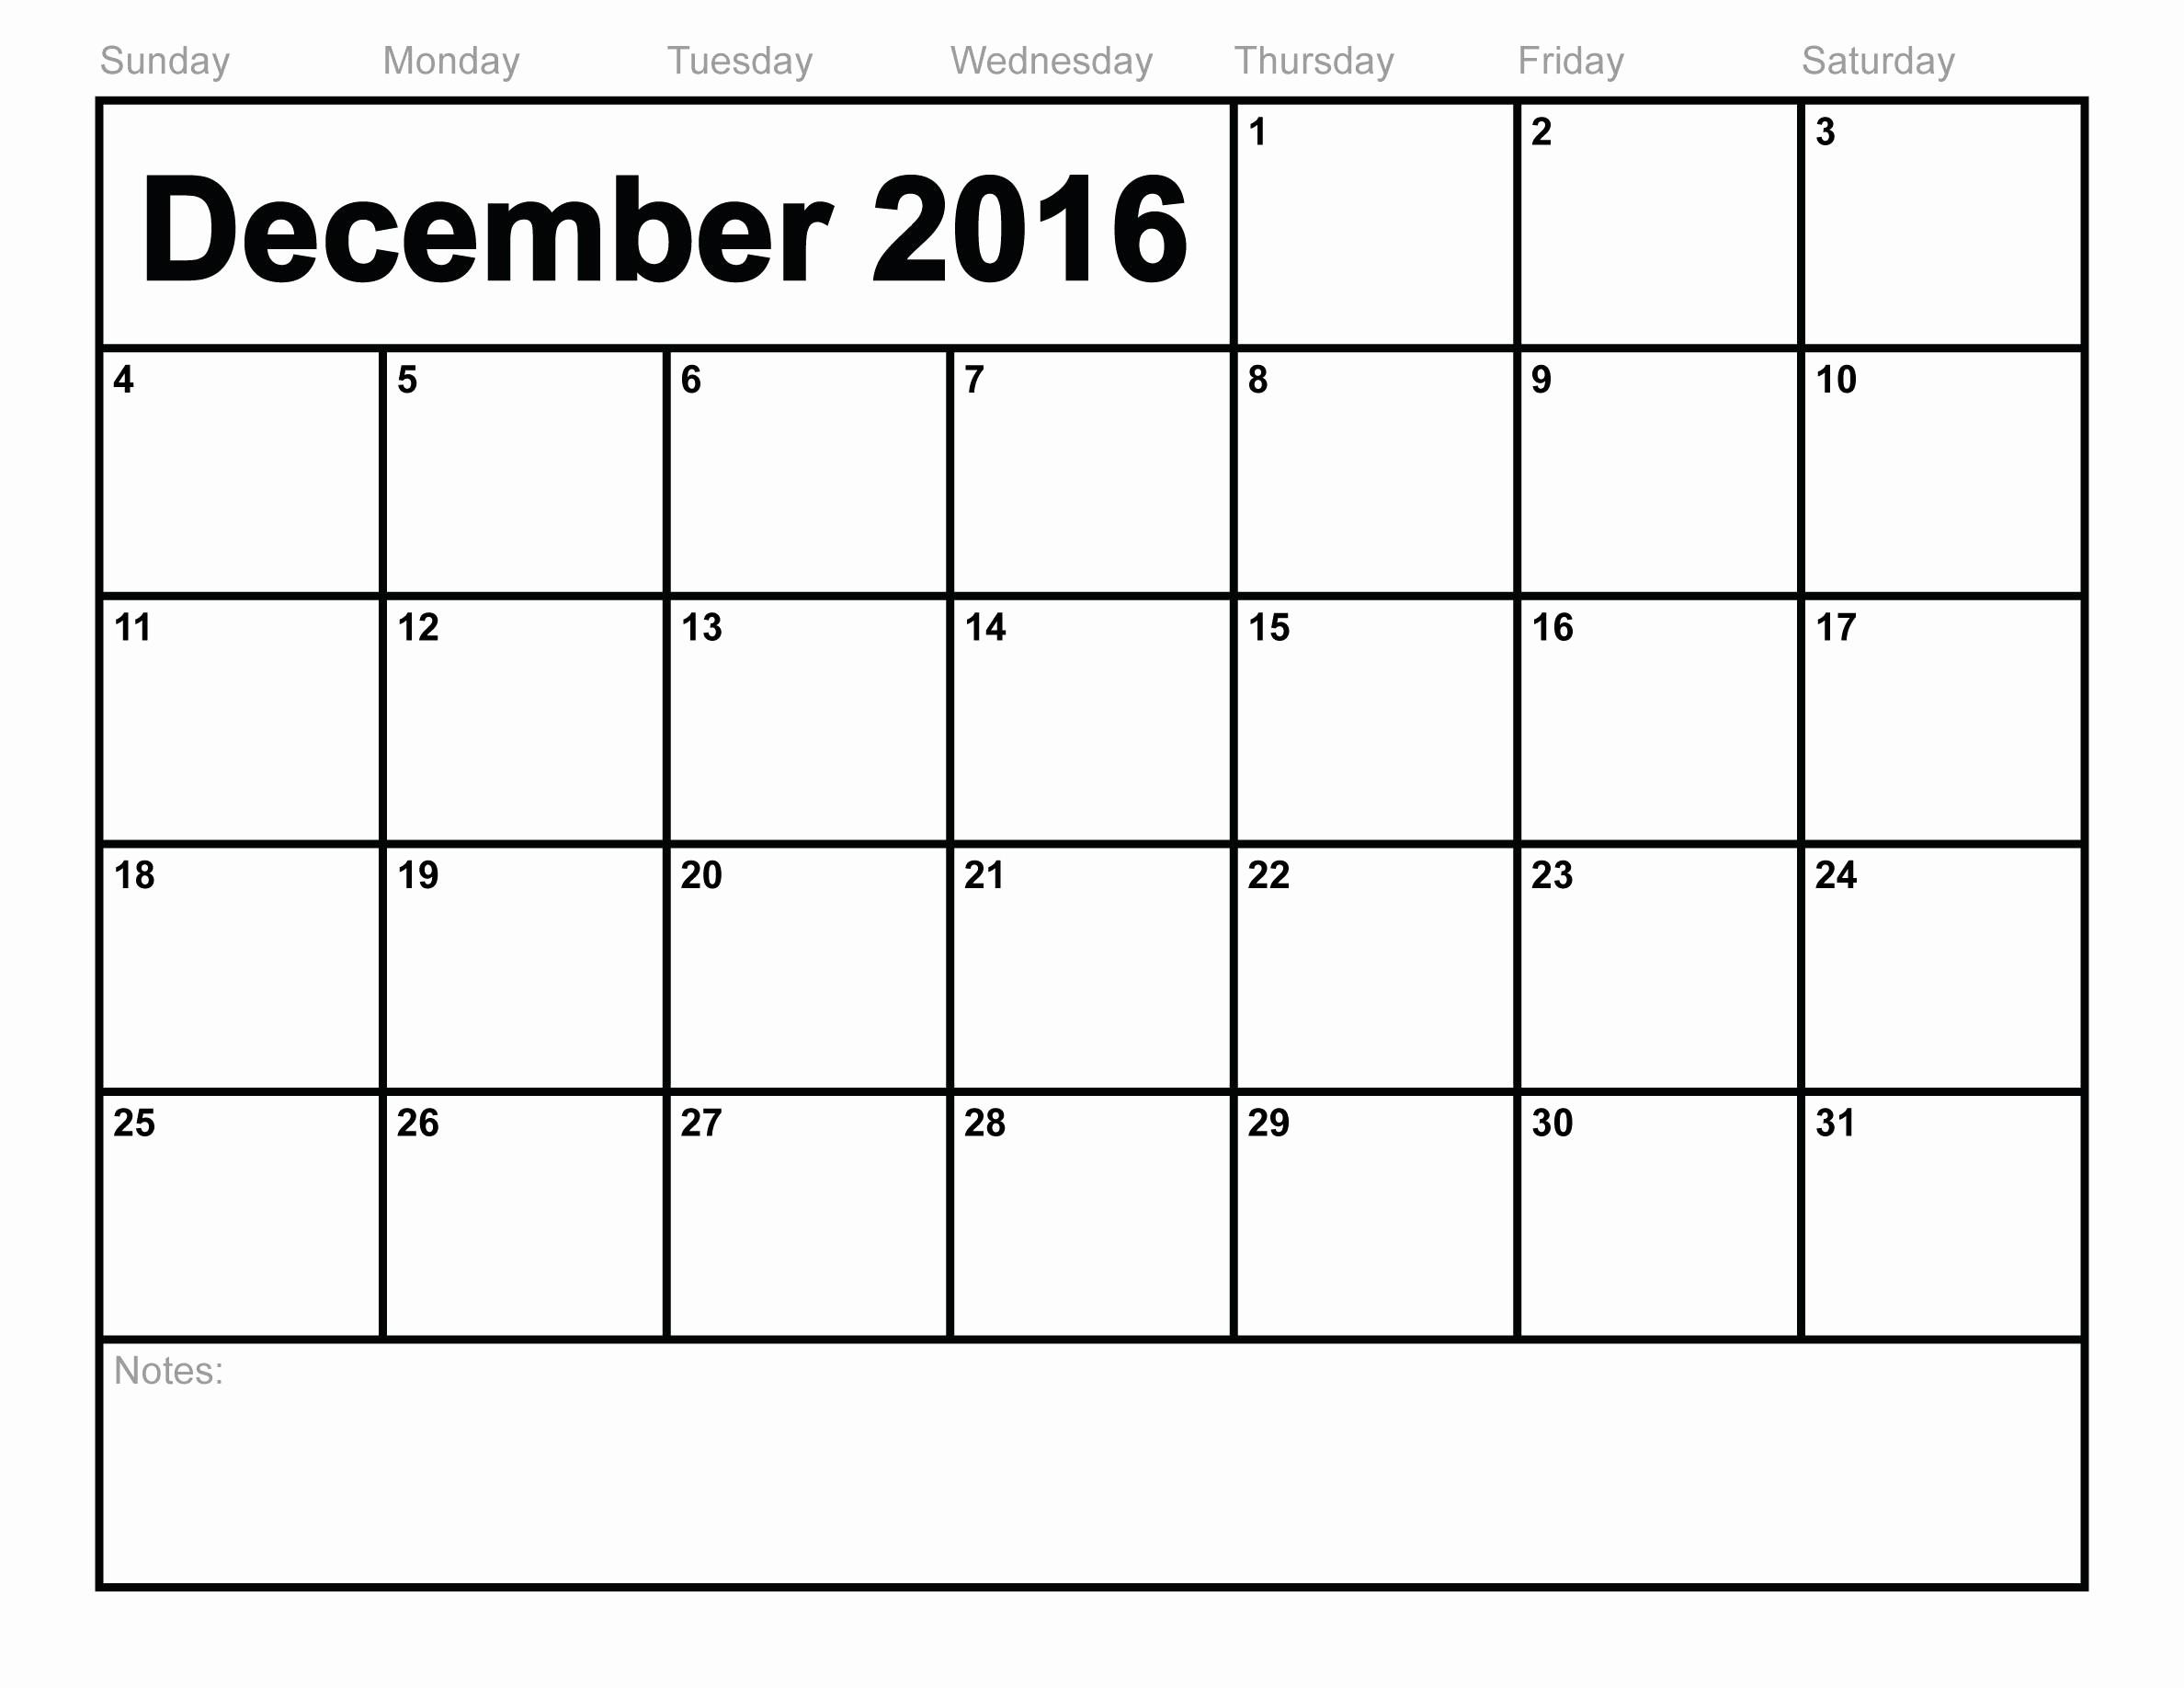 Blank December Calendar 2016 Printable Elegant Blank December 2016 Calendar Free Printable 2018